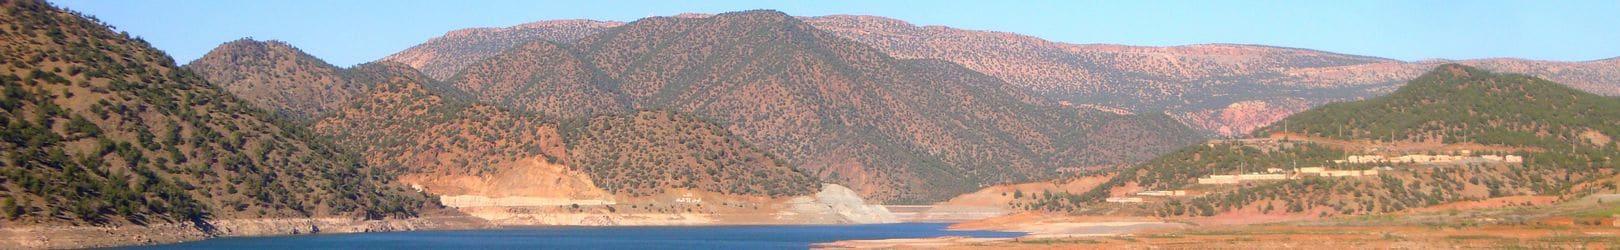 Bandeau légende Isli et Tislit, Maroc